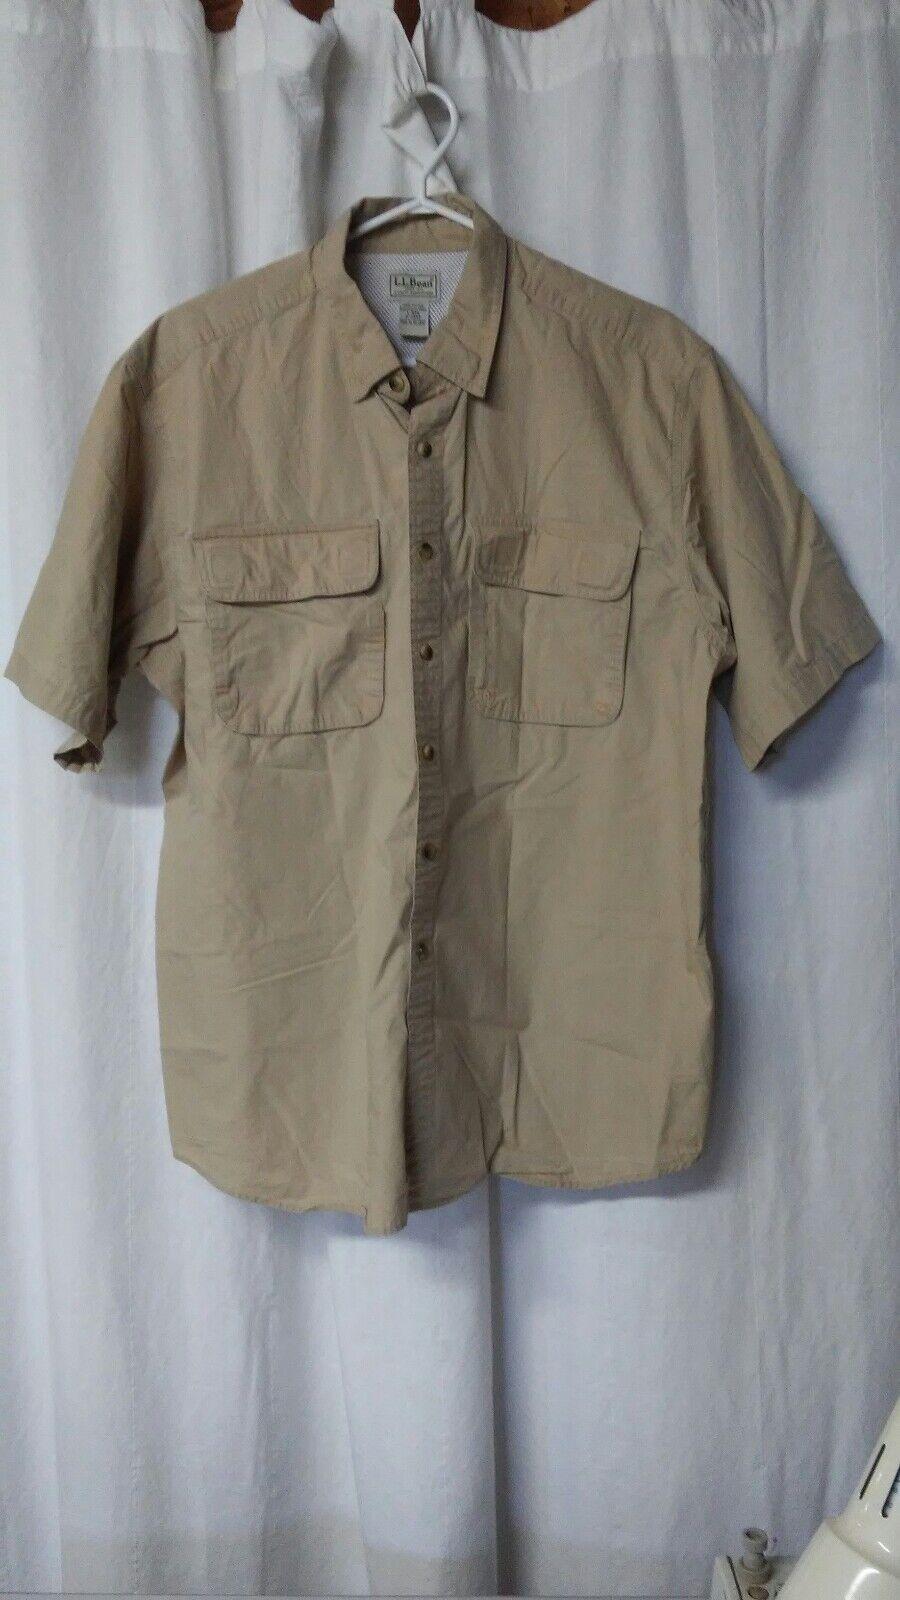 Vintage LL BEAN Mens L Short Sleeve Outdoor Safari Button Shirt Tan